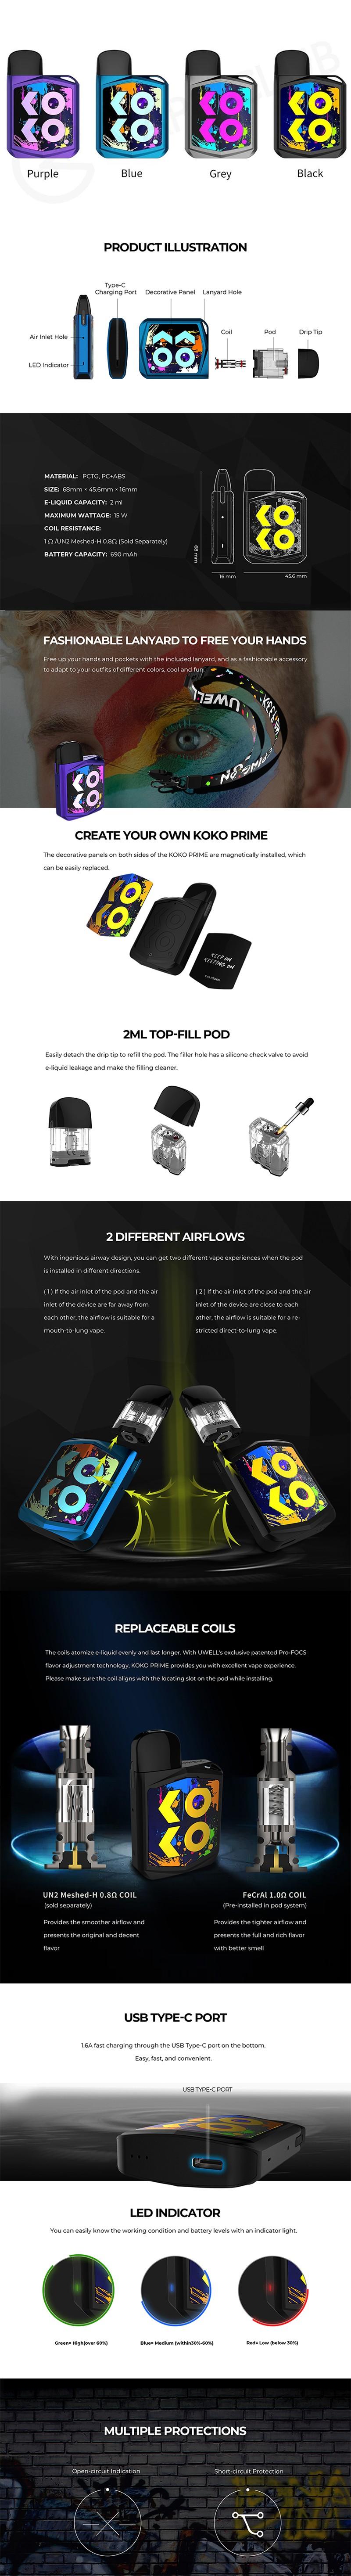 Authentic Uwell Caliburn KOKO Prime 15W Pod System Kit